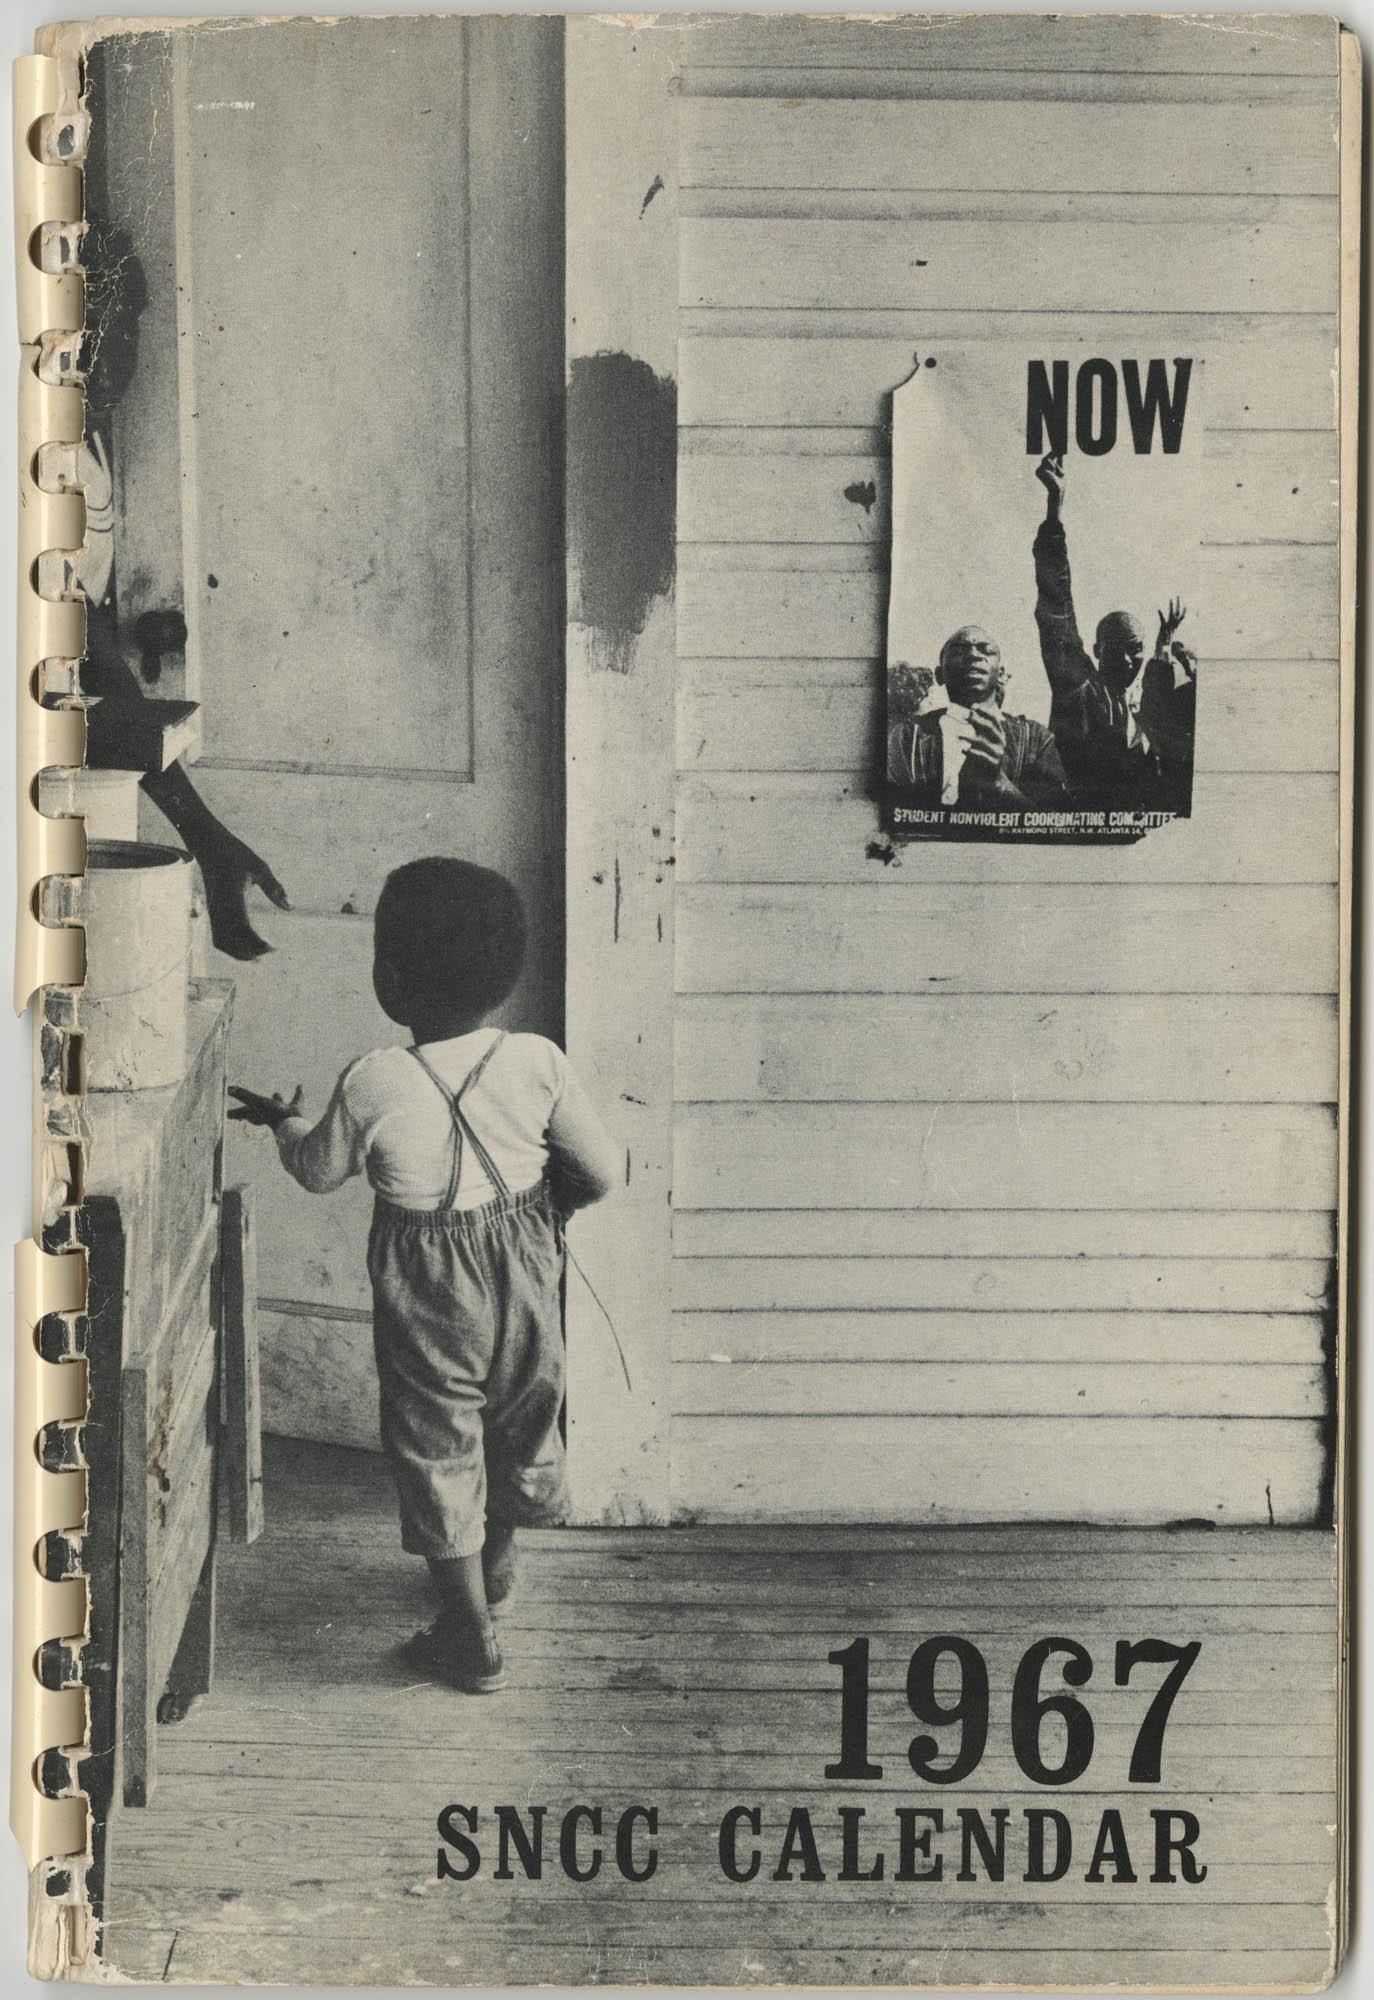 1967 SNCC Calendar, Front Cover